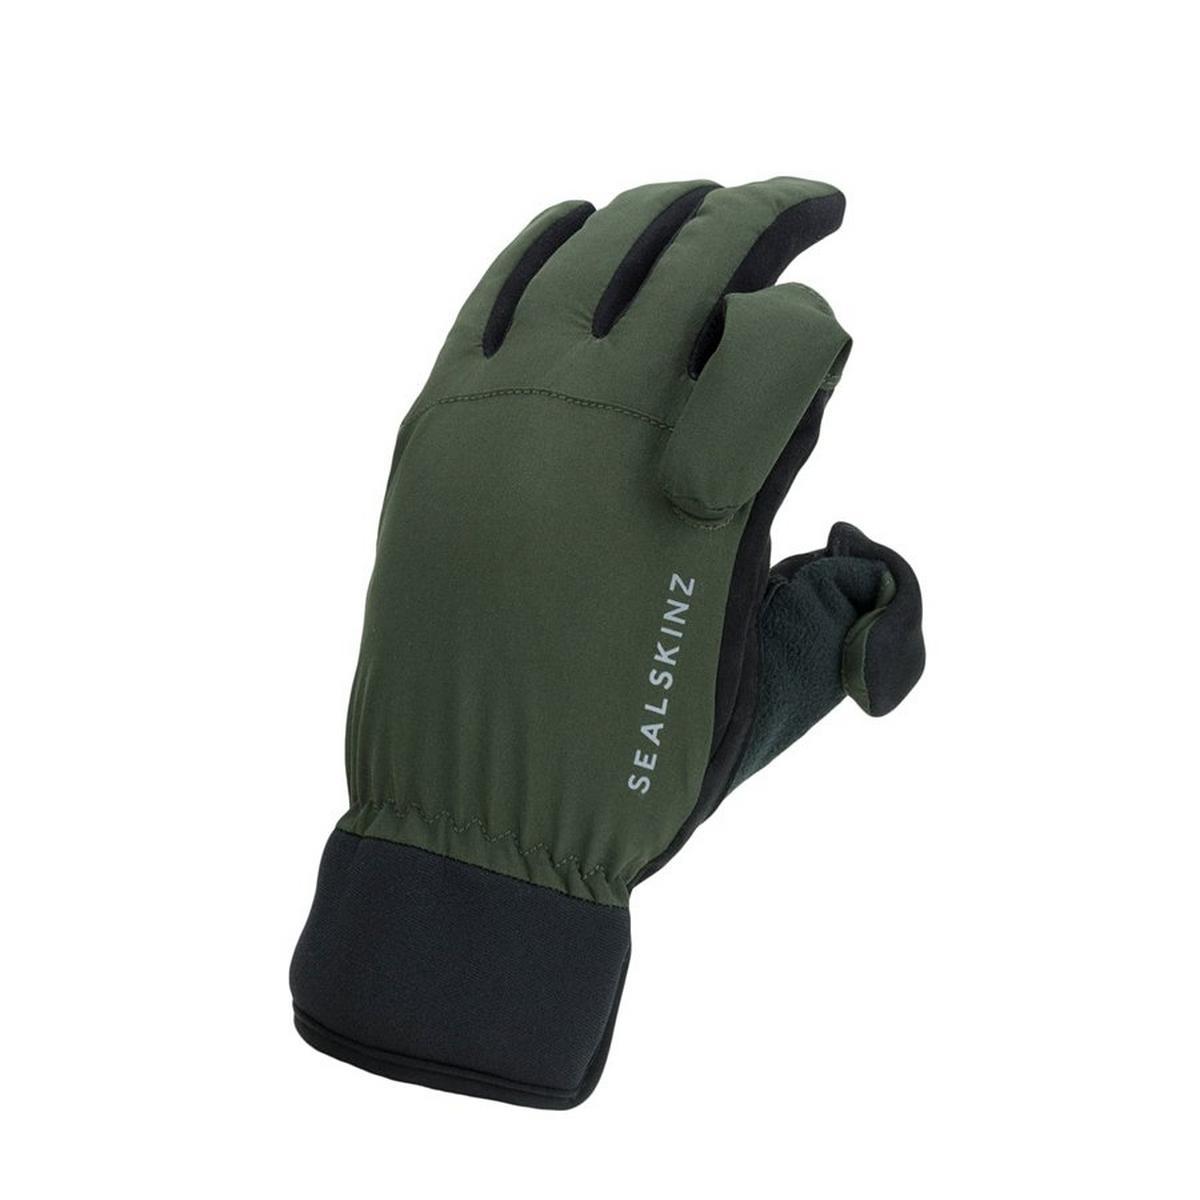 Sealskinz Unisex Sealskinz Waterproof All Weather Sport Glove - Green